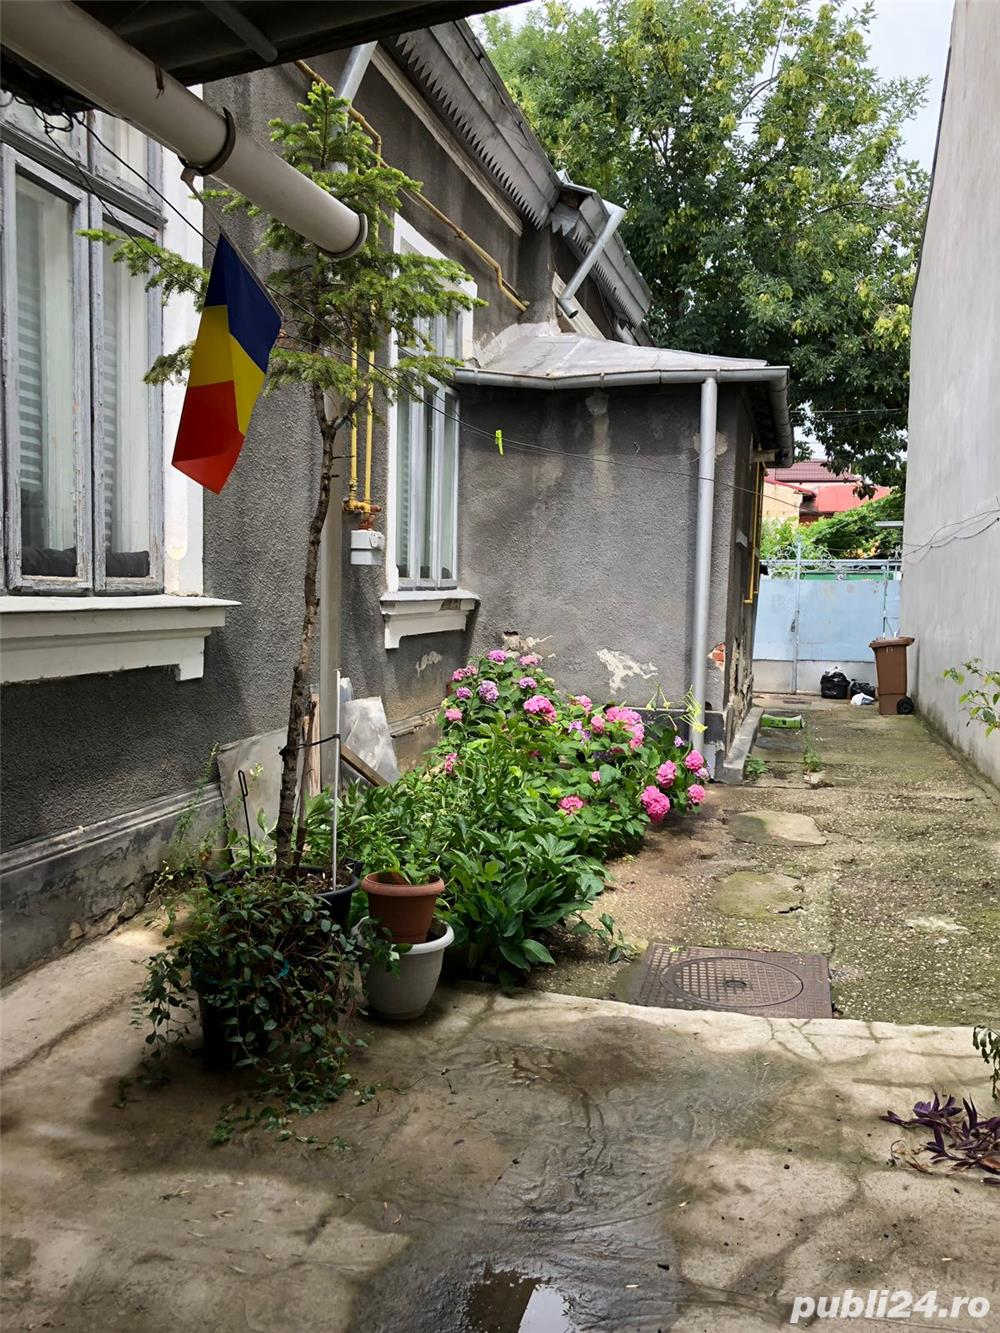 Vand casa la curte Matei Basarab - Popa Nan - Piata Alba Iulia